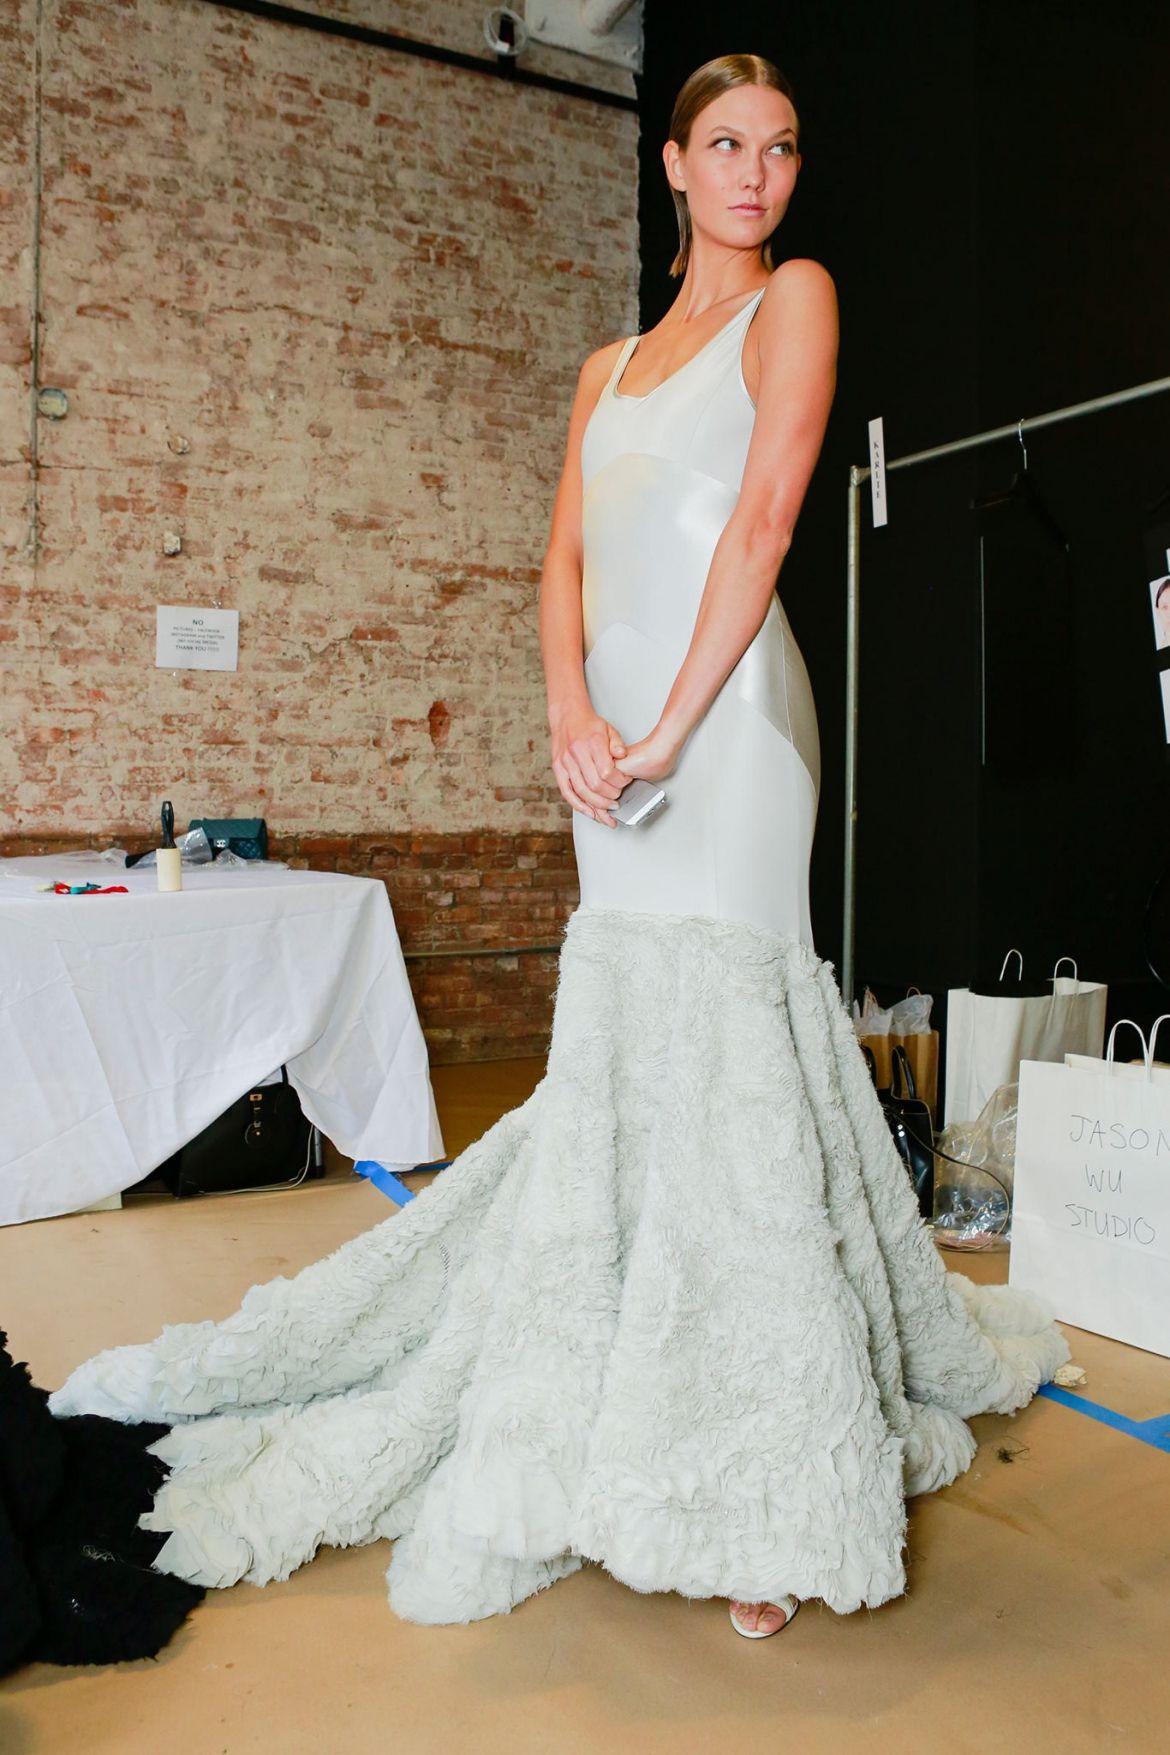 Pin By Joanahairwedding On Wedding Ideas For You Pinterest Jason Wu Dress And Weddings